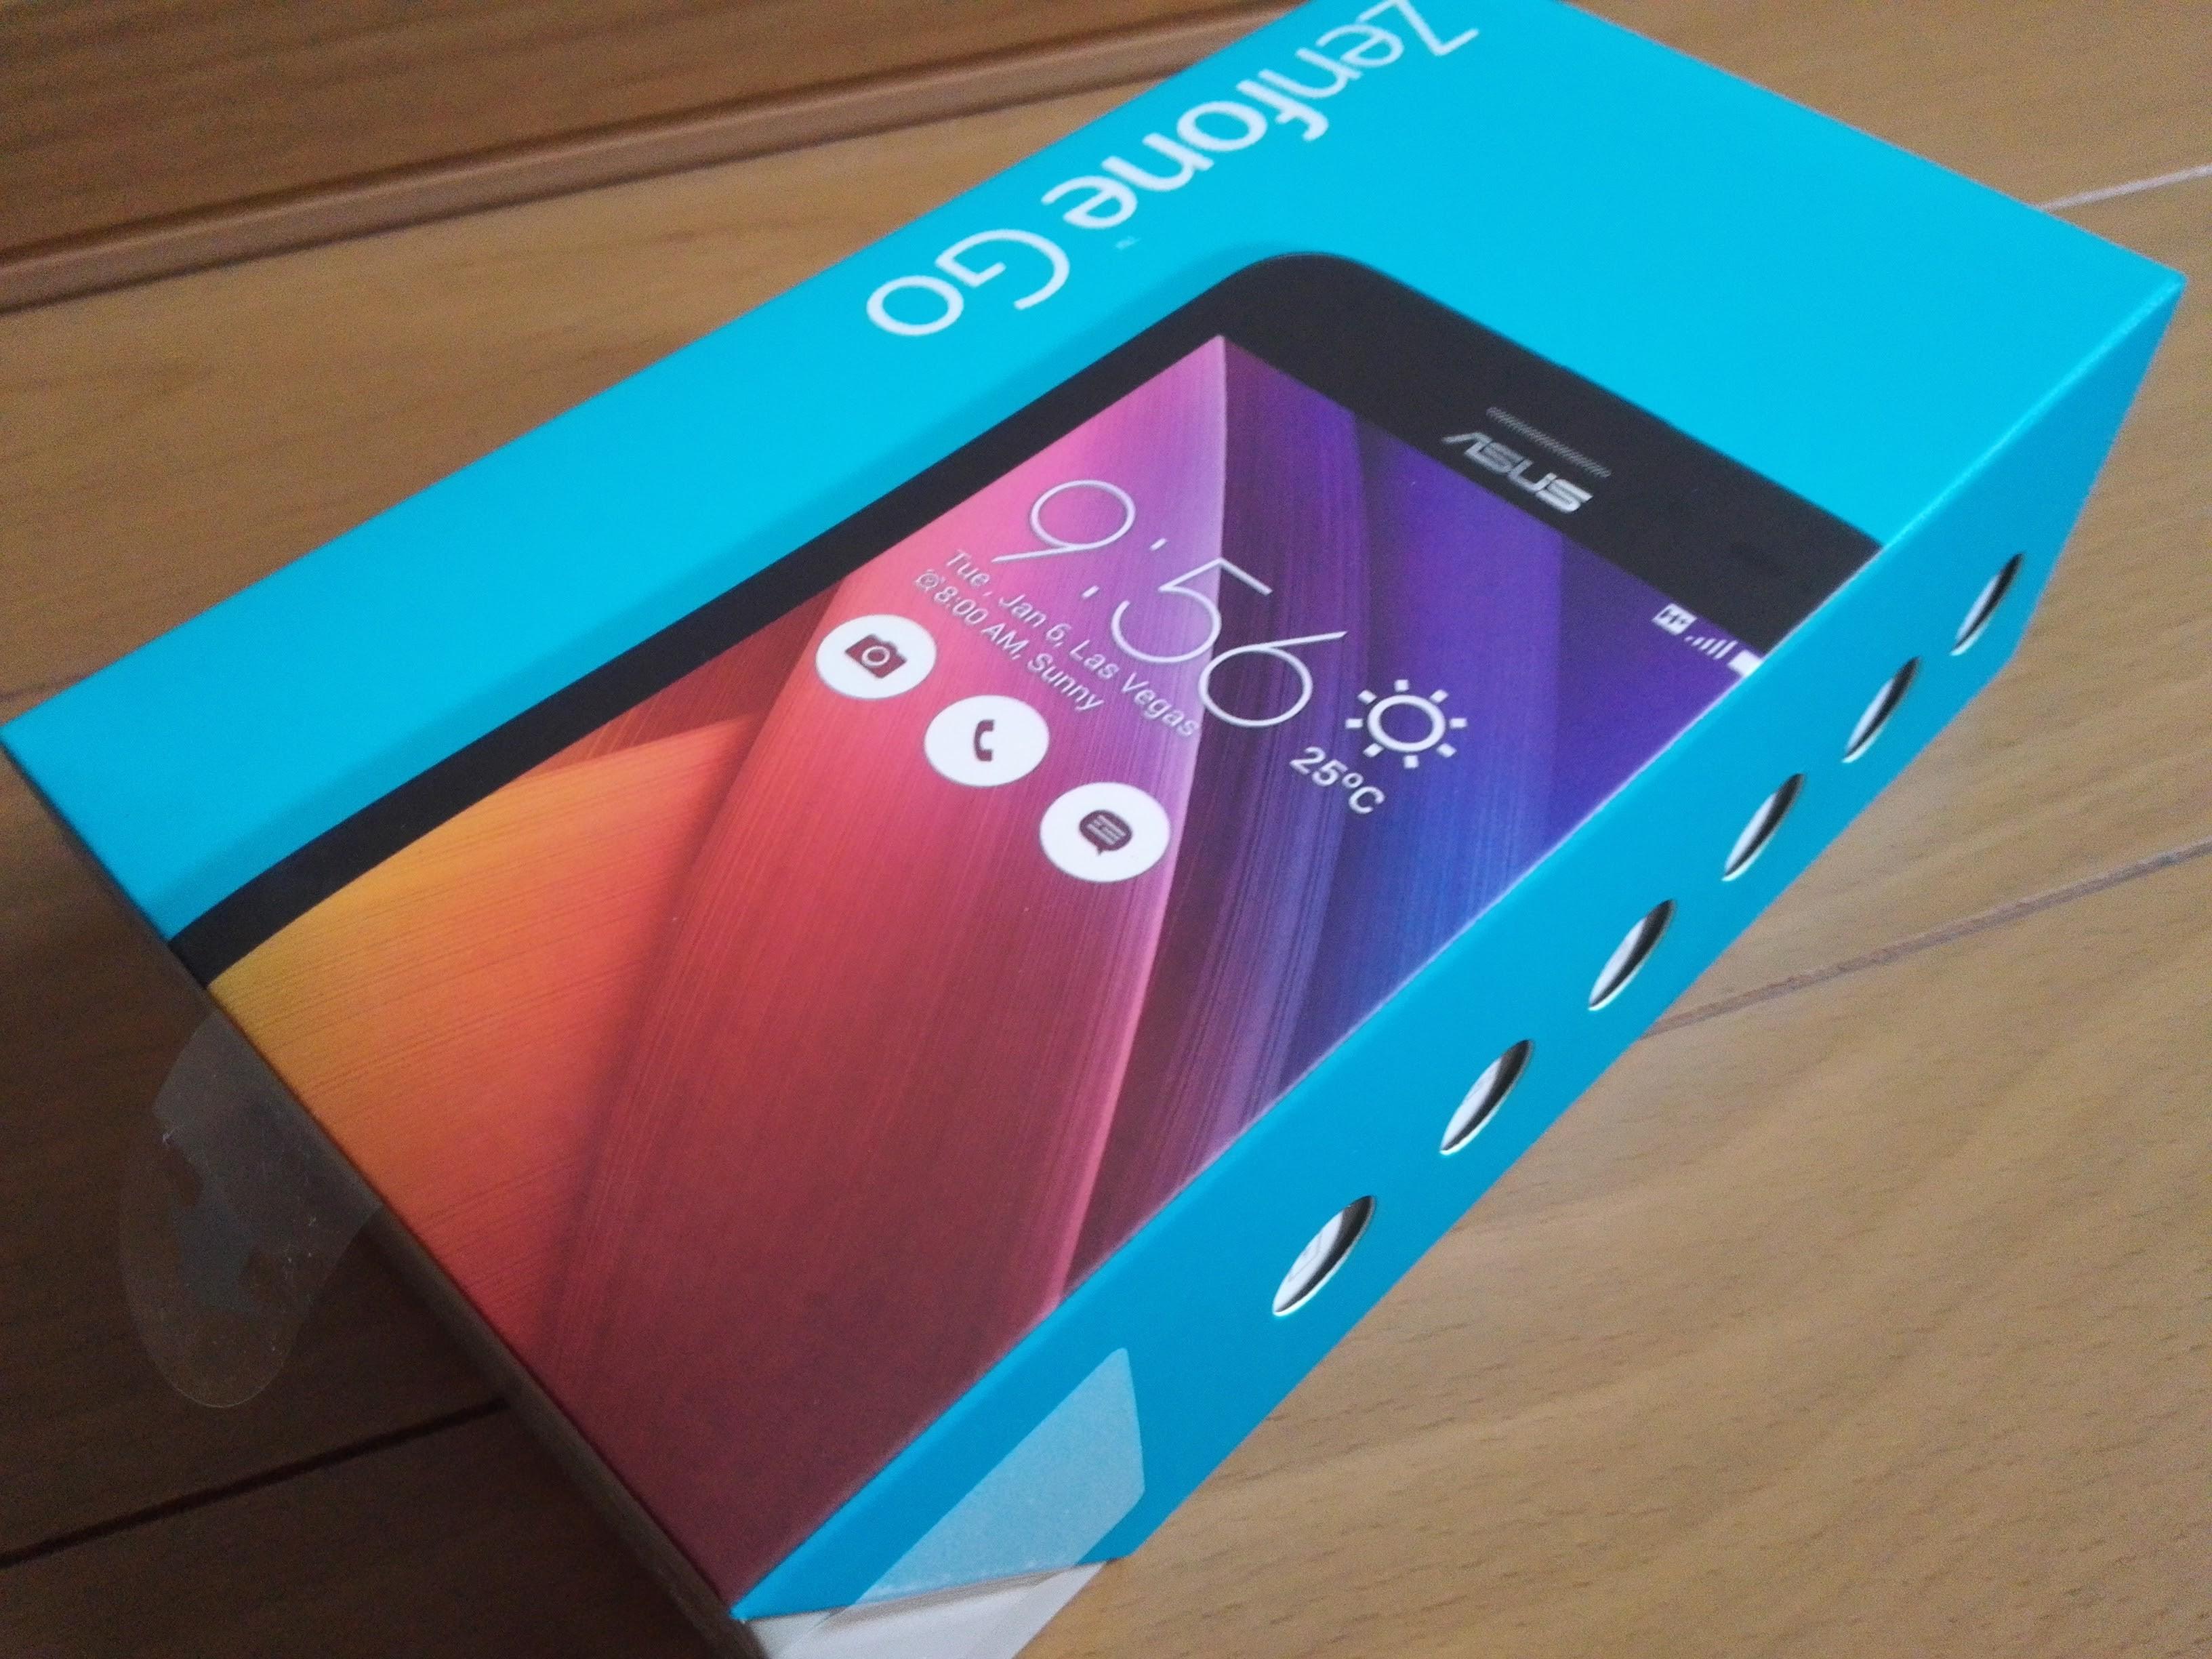 ASUS「ZenFone Go」 au VoLTEに対応するアップデートを提供開始